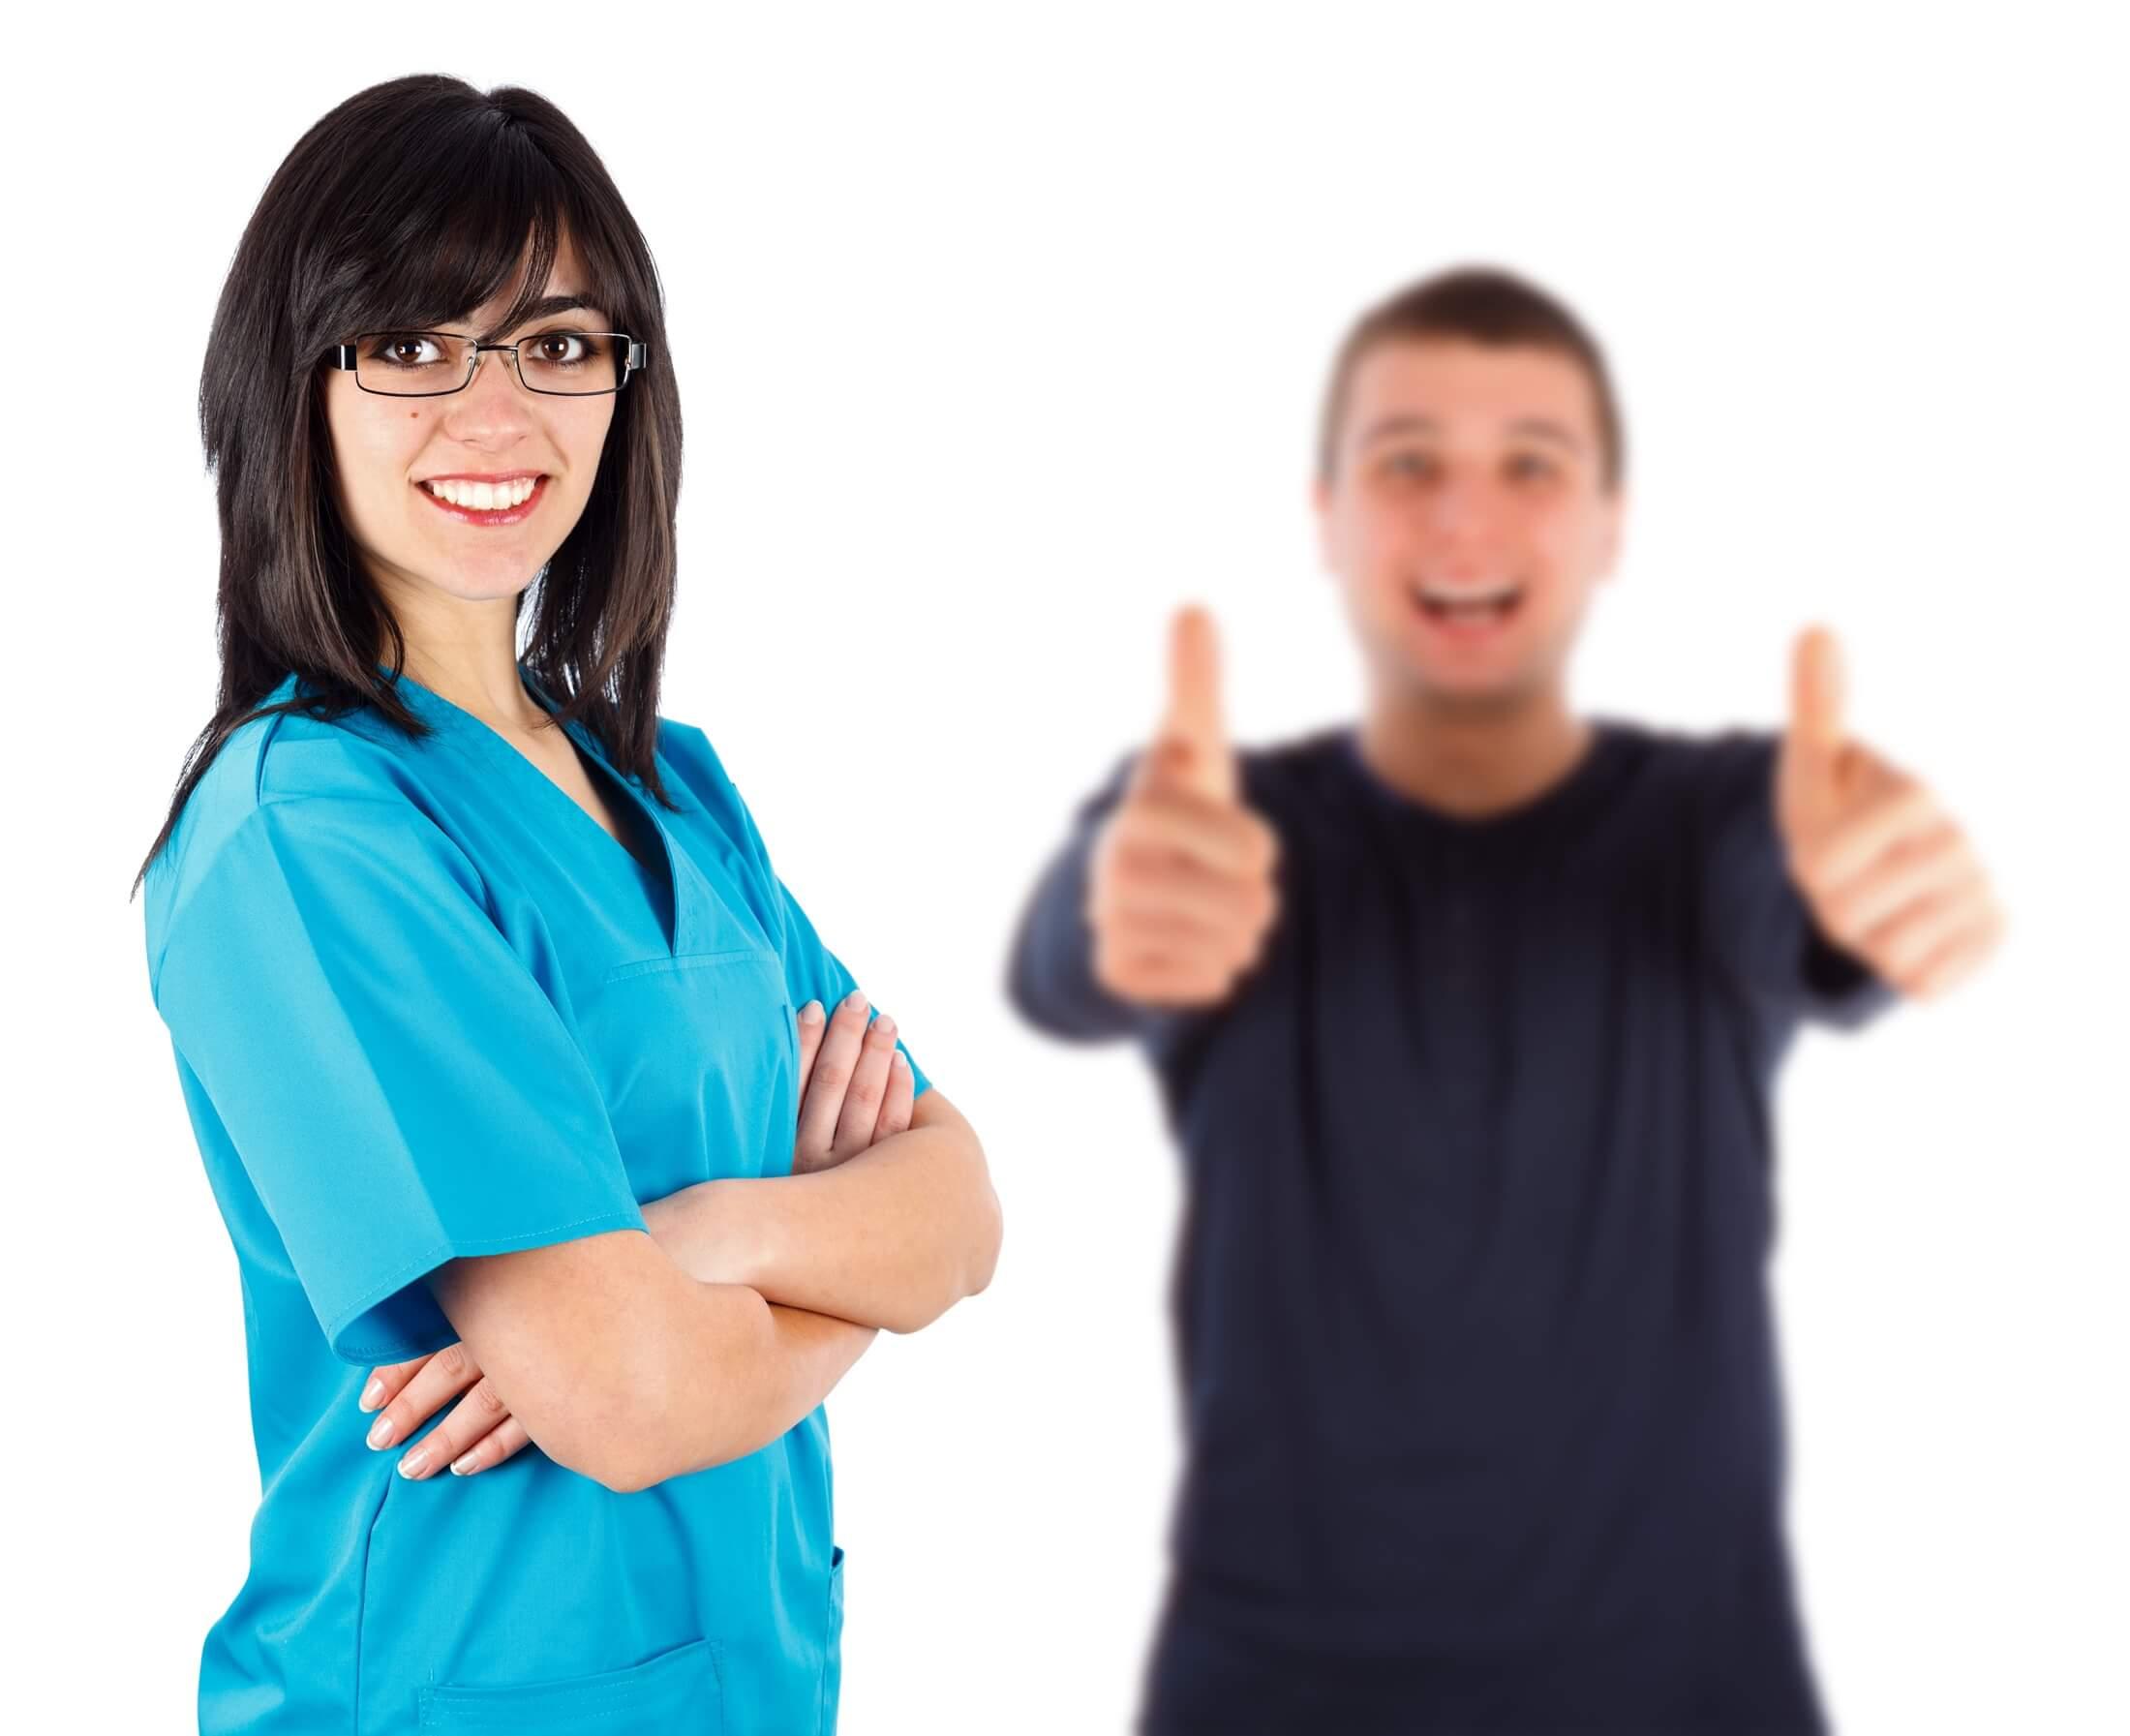 Patient surveys are a great way to improve patient satisfaction